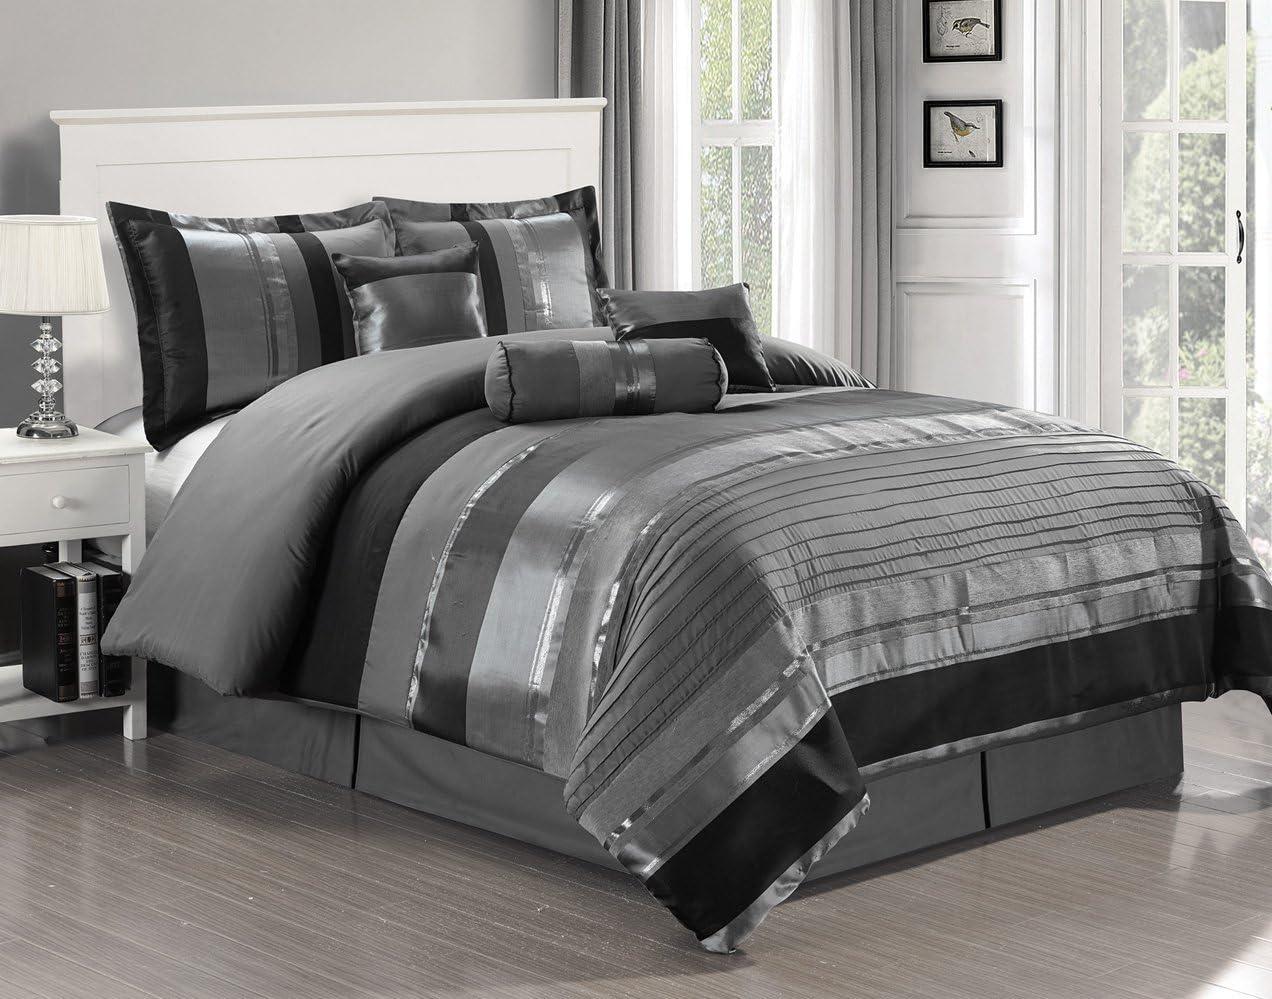 "7 Piece Oversize Grey / Black silver stripe Chenille Comforter set 106"" X 94"" King Size Bedding"